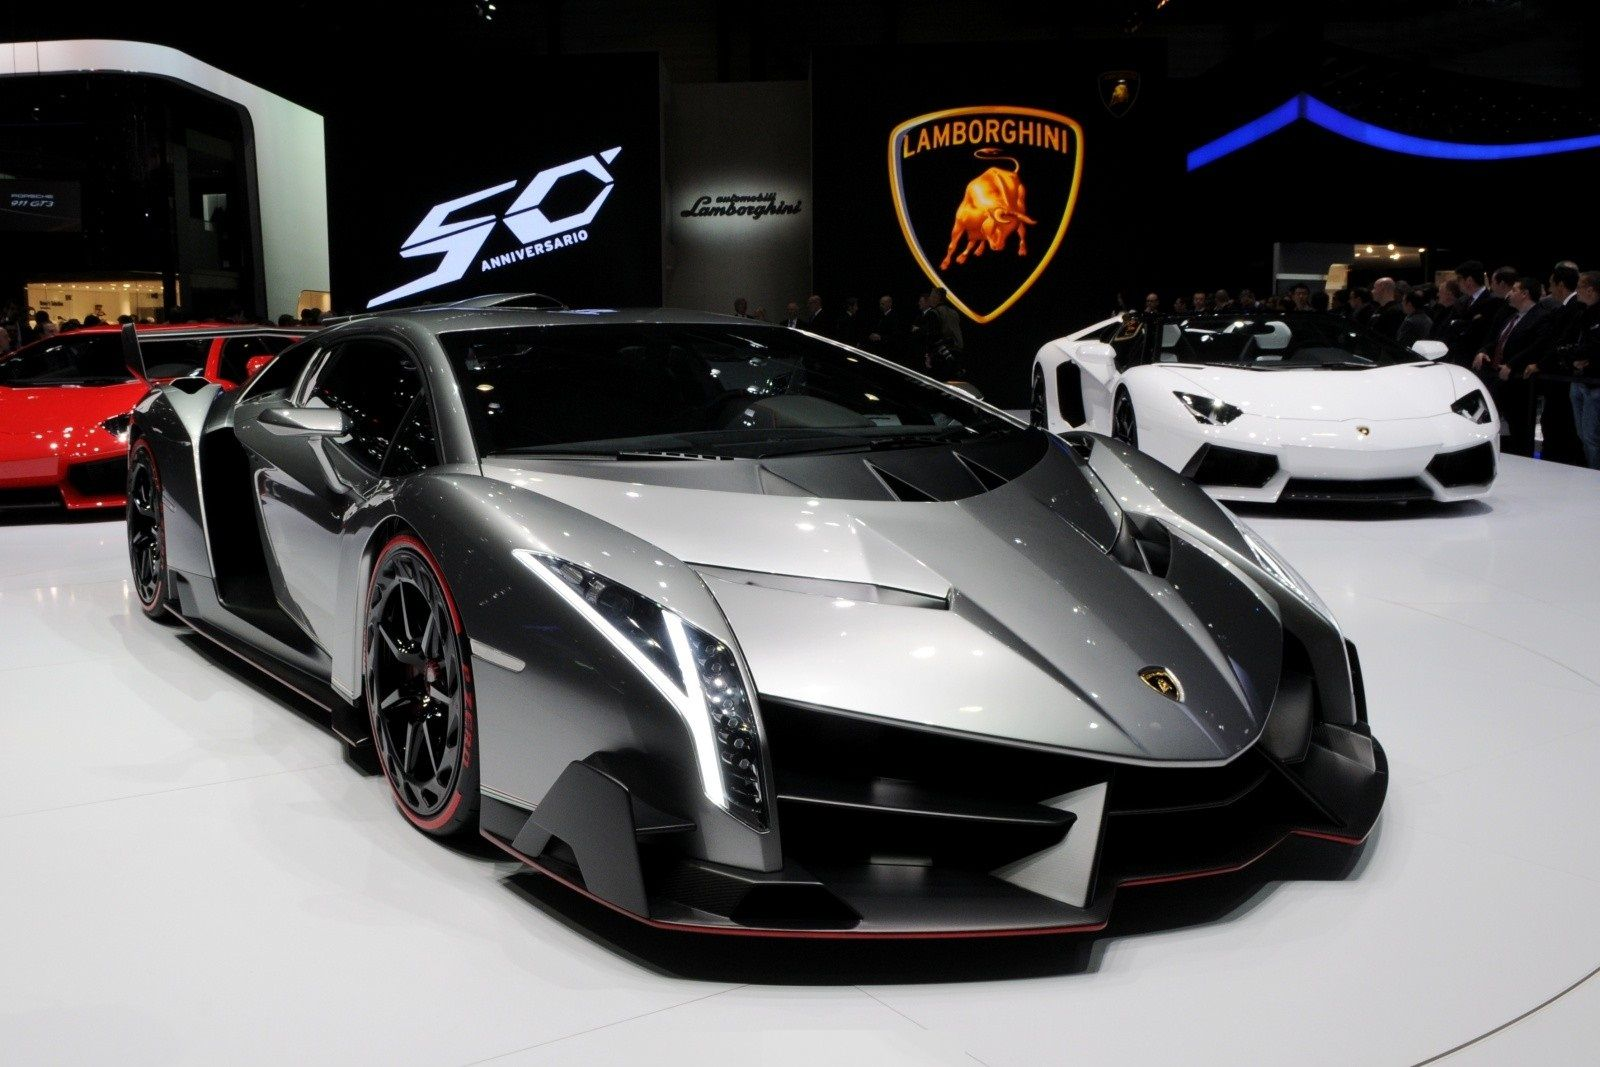 Lamborghini Veneno Hd Wallpaper 1080p Savagelyrich Lamborghini